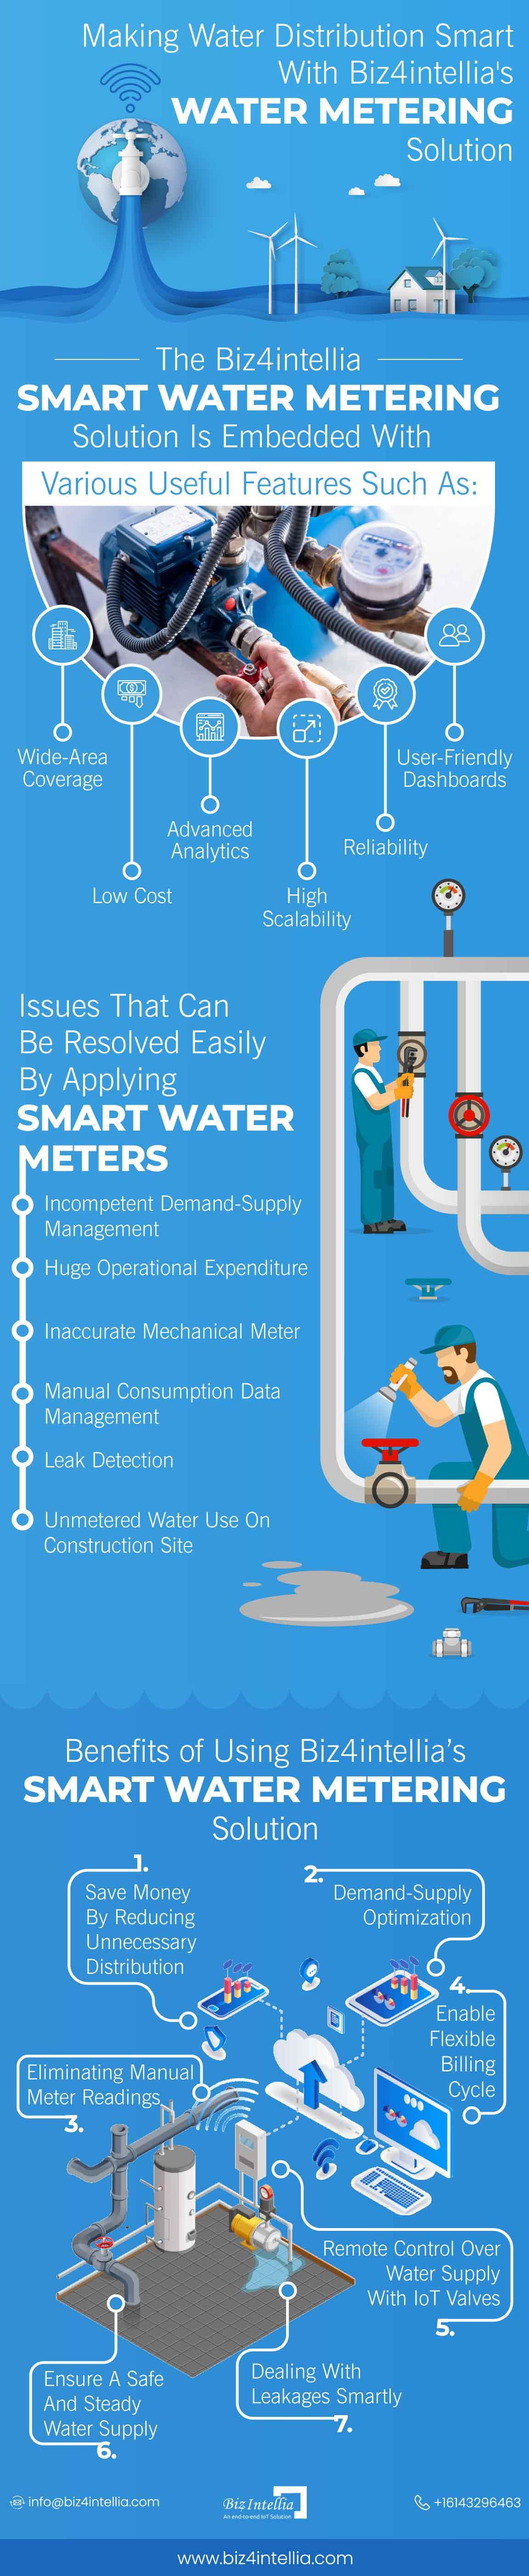 making-water-distribution-smart-with-biz4intellia-water-metering-solution